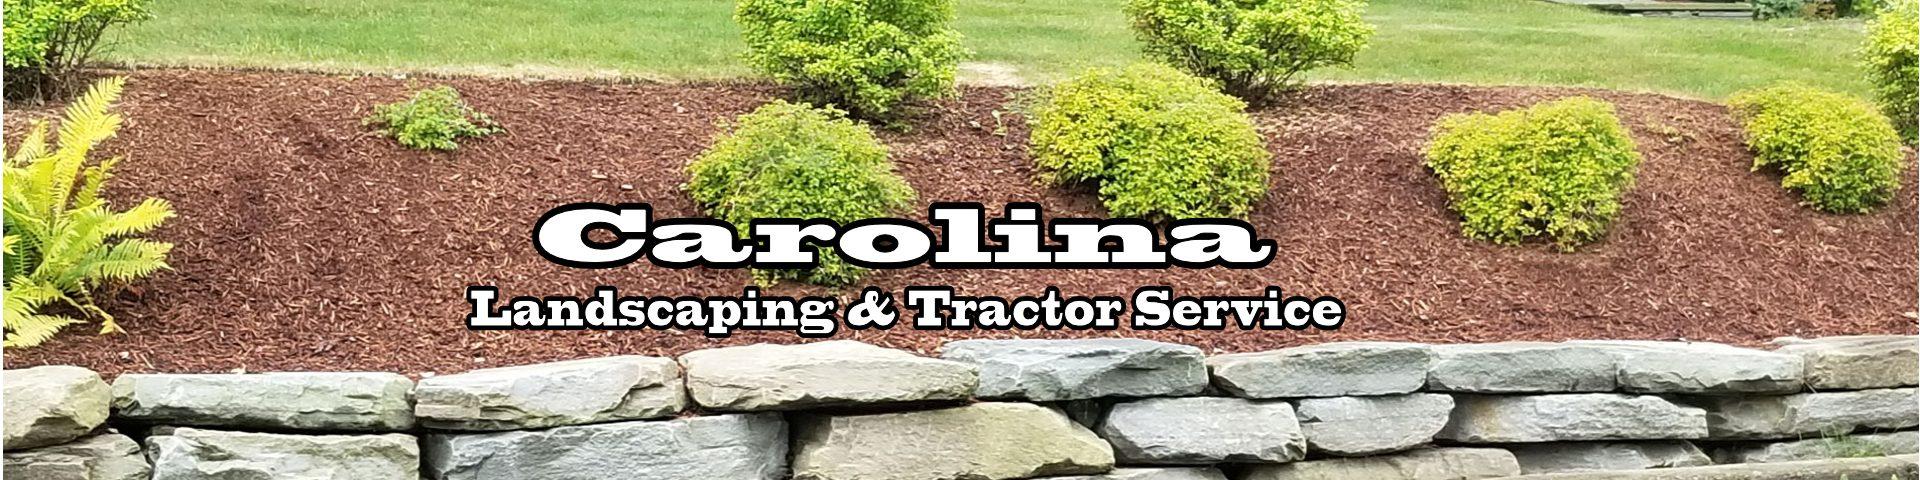 Carolina Landscape Tractor Service Nc Kitty Hawk Obx Live